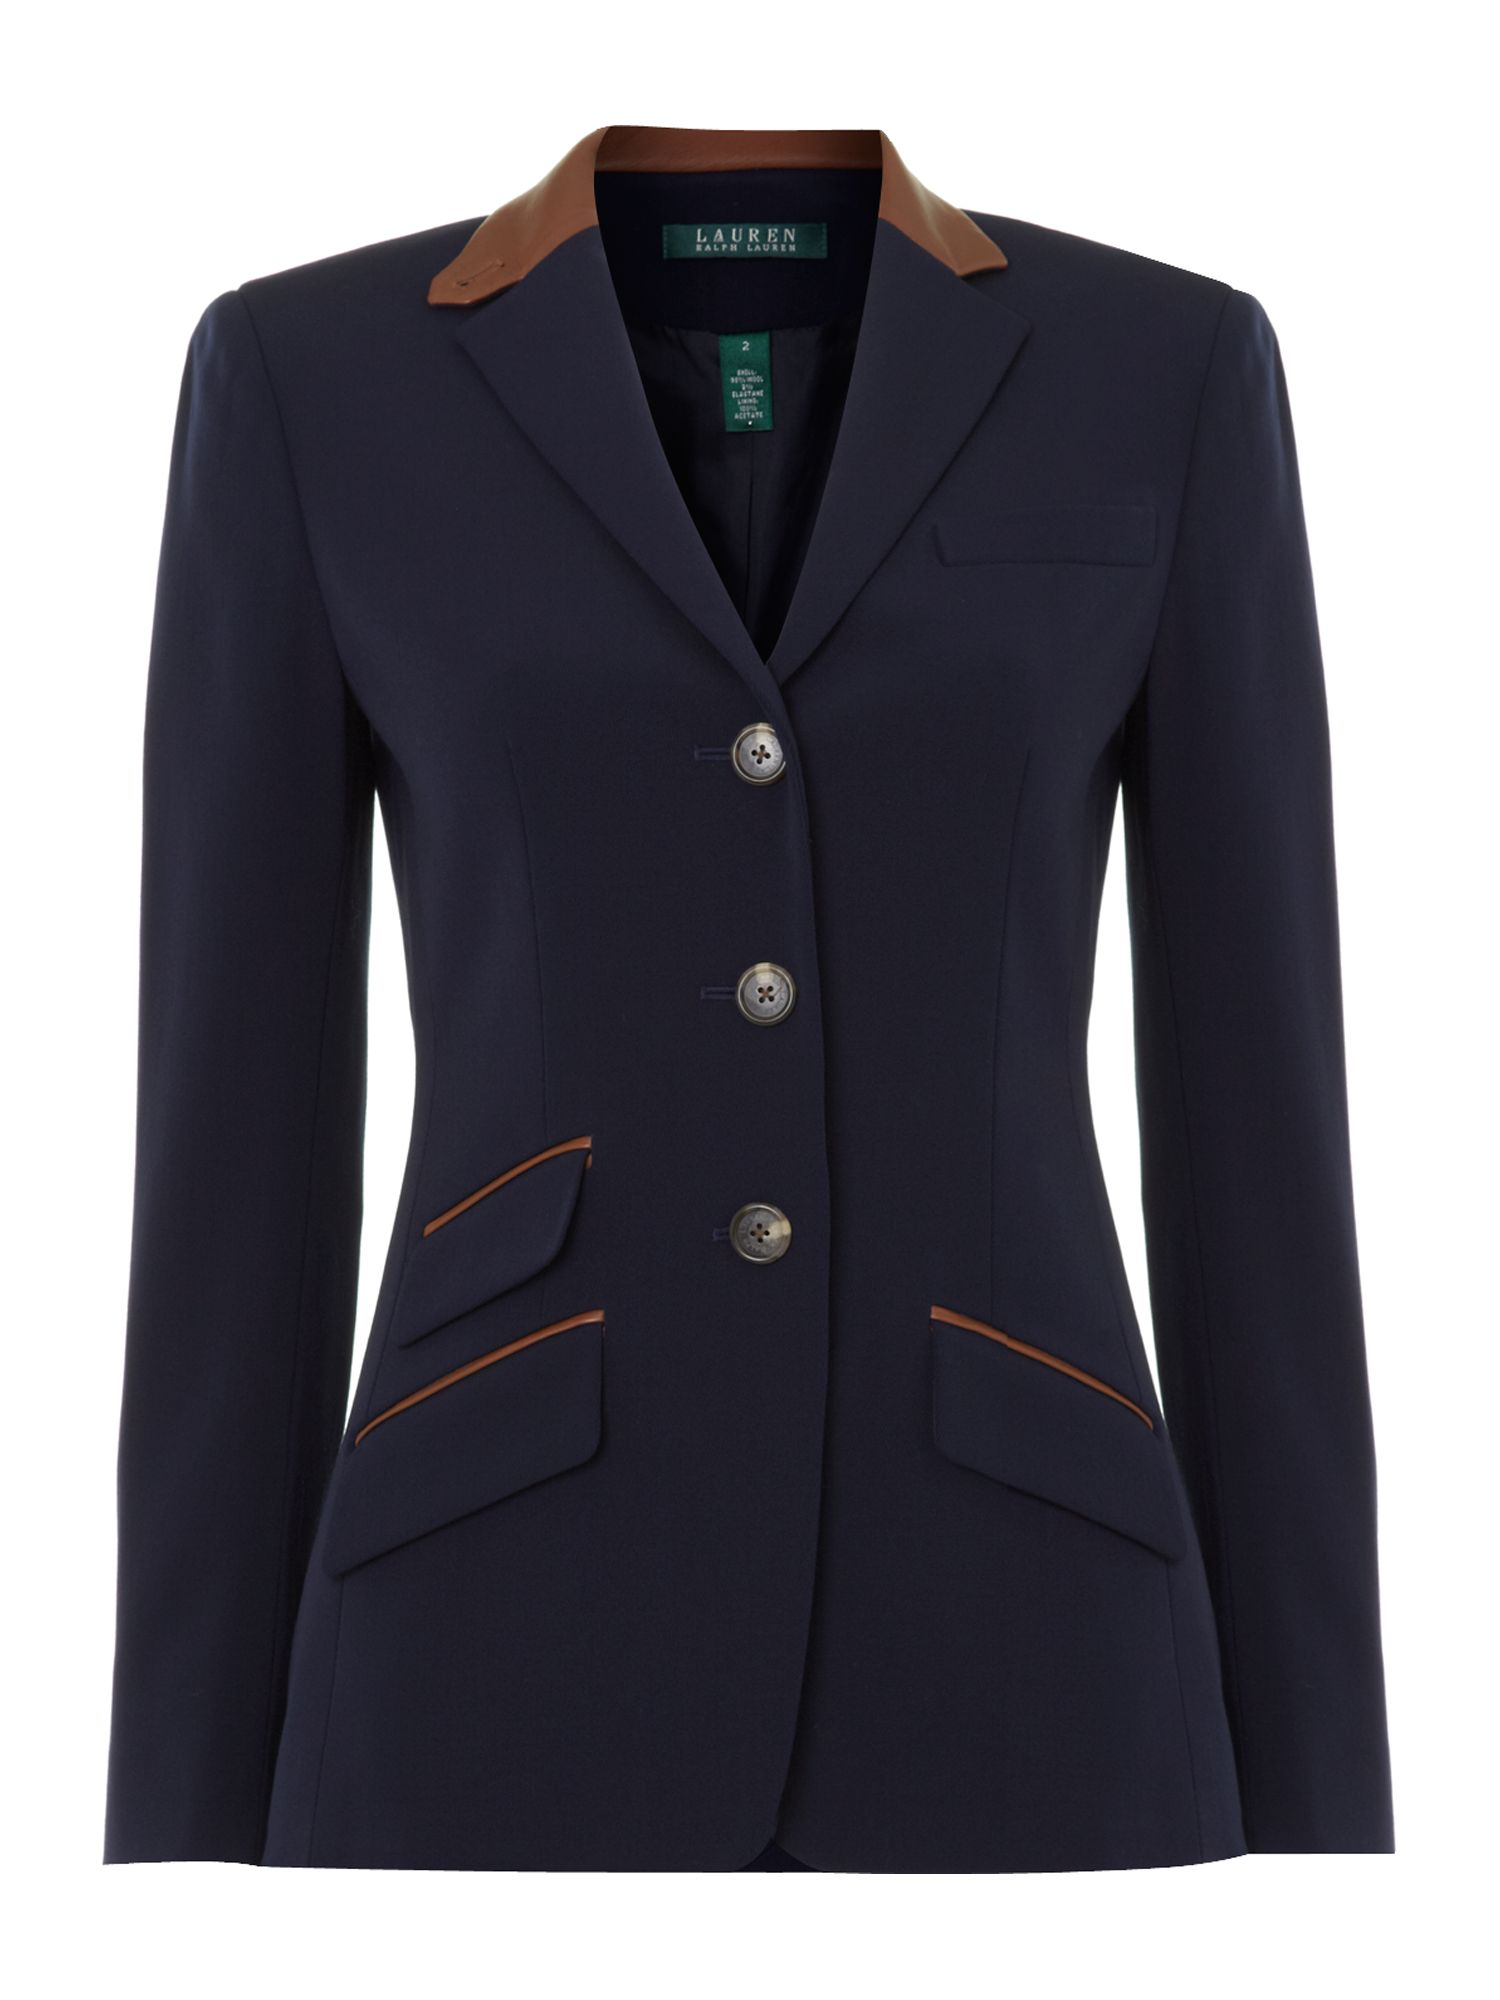 lauren by ralph lauren blazer with leather collar detail in blue navy lyst. Black Bedroom Furniture Sets. Home Design Ideas